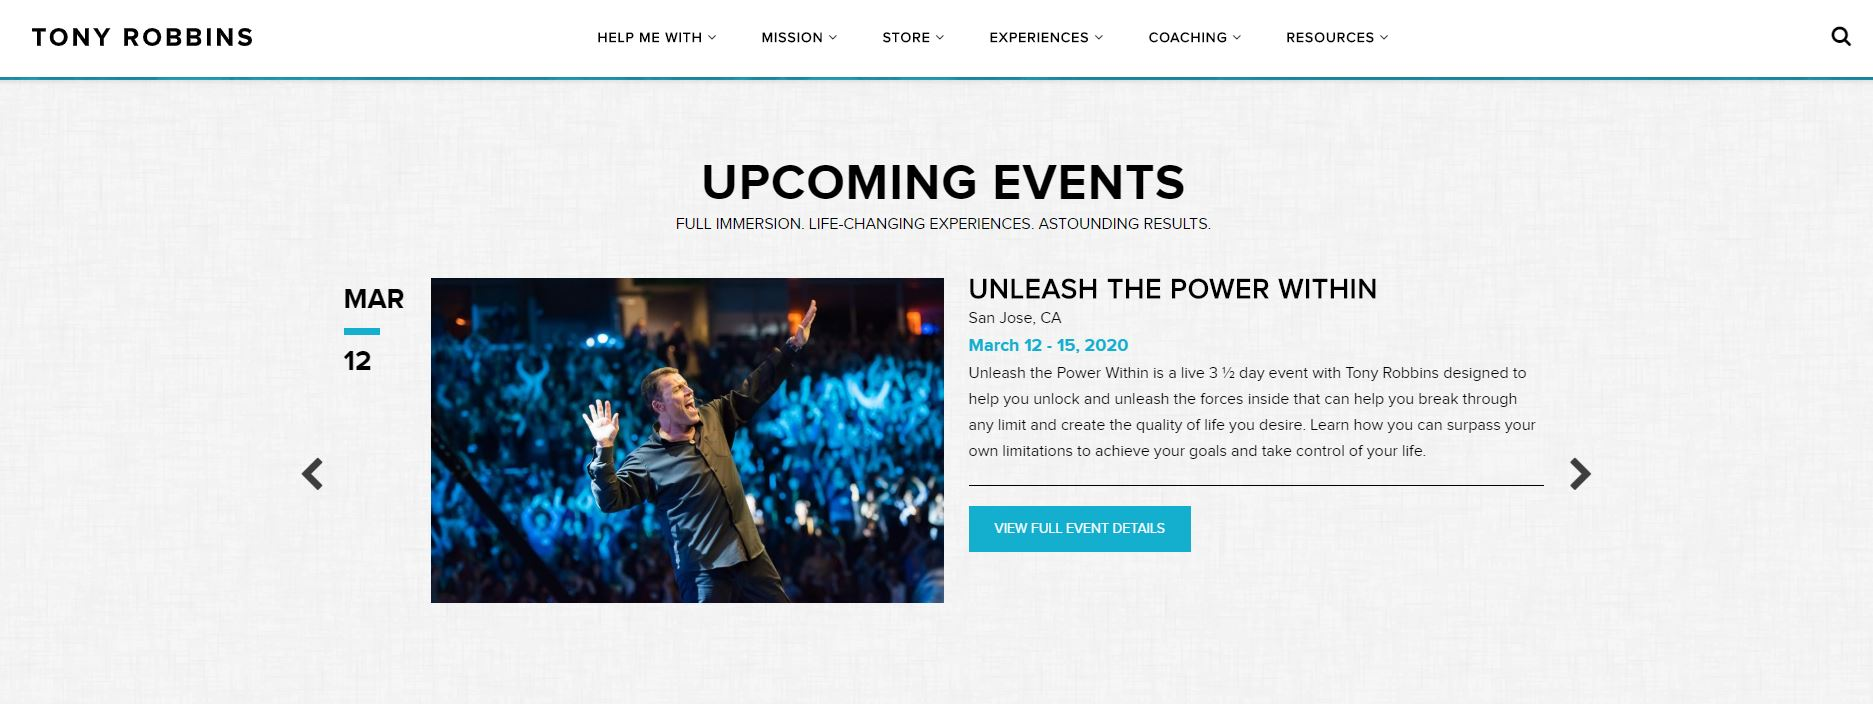 Tony Robbins site